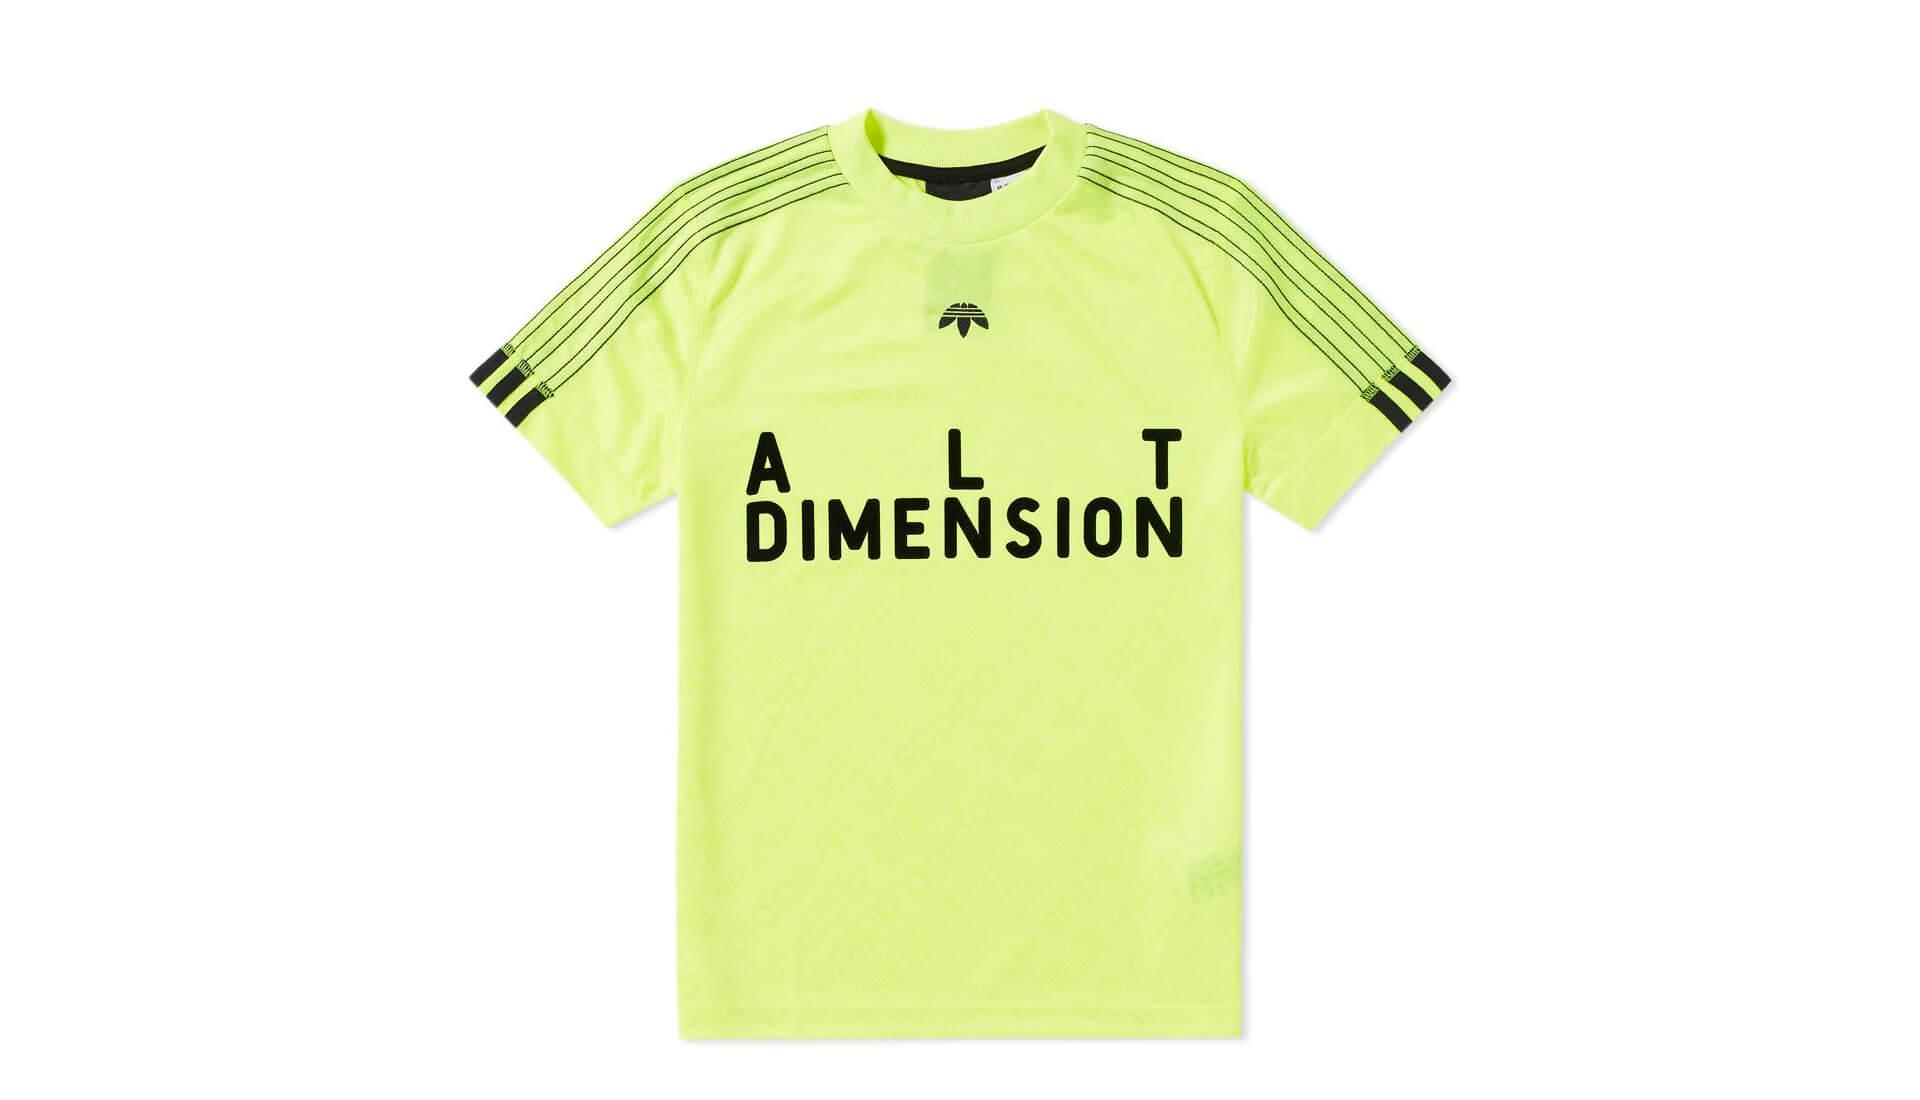 88e9c1ea5 adidas Originals by Alexander Wang Soccer Jerseys - SoccerBible.